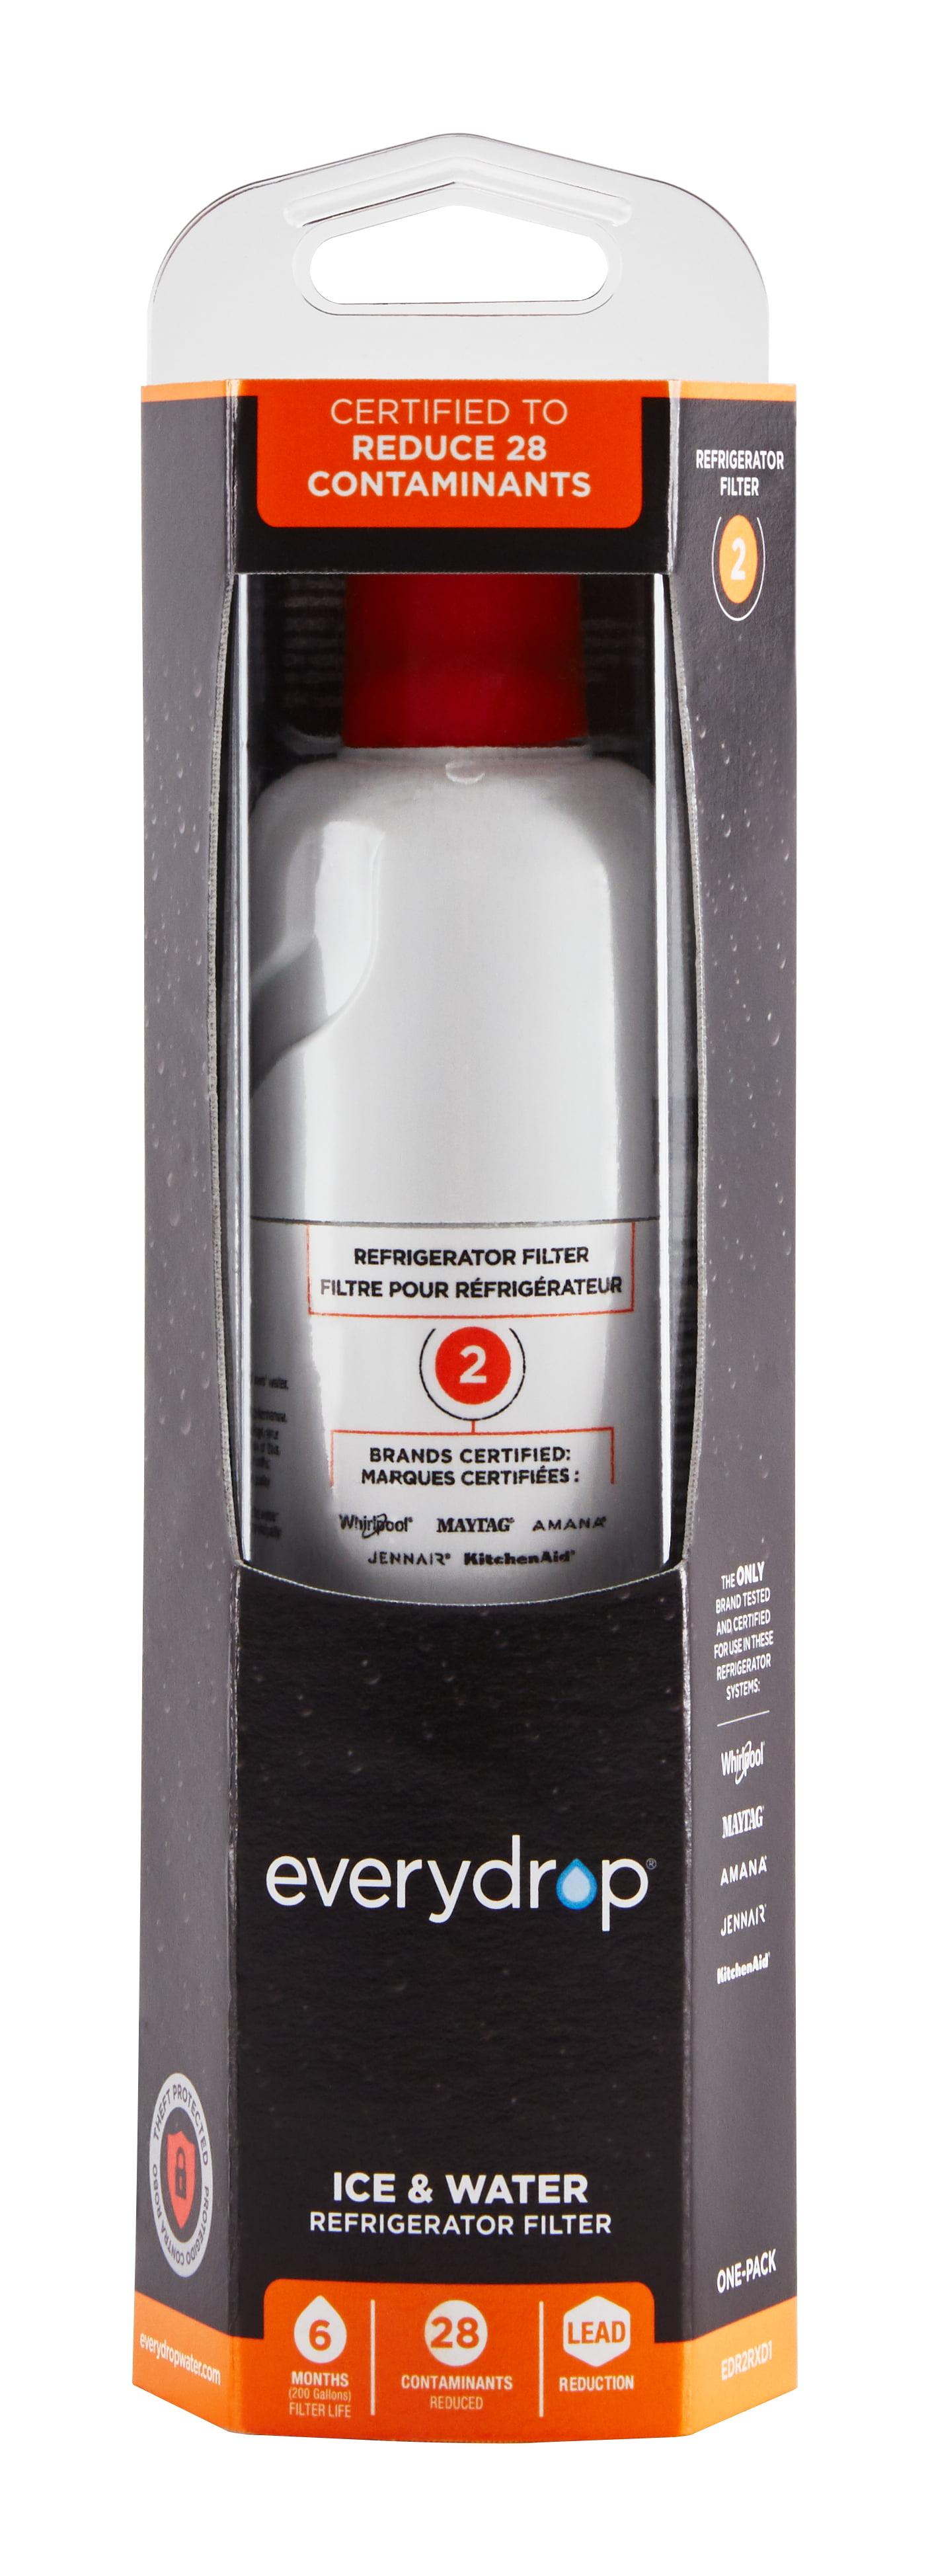 everydrop Refrigerator Water Filter #2 EDR2RXD1 - Walmart.com